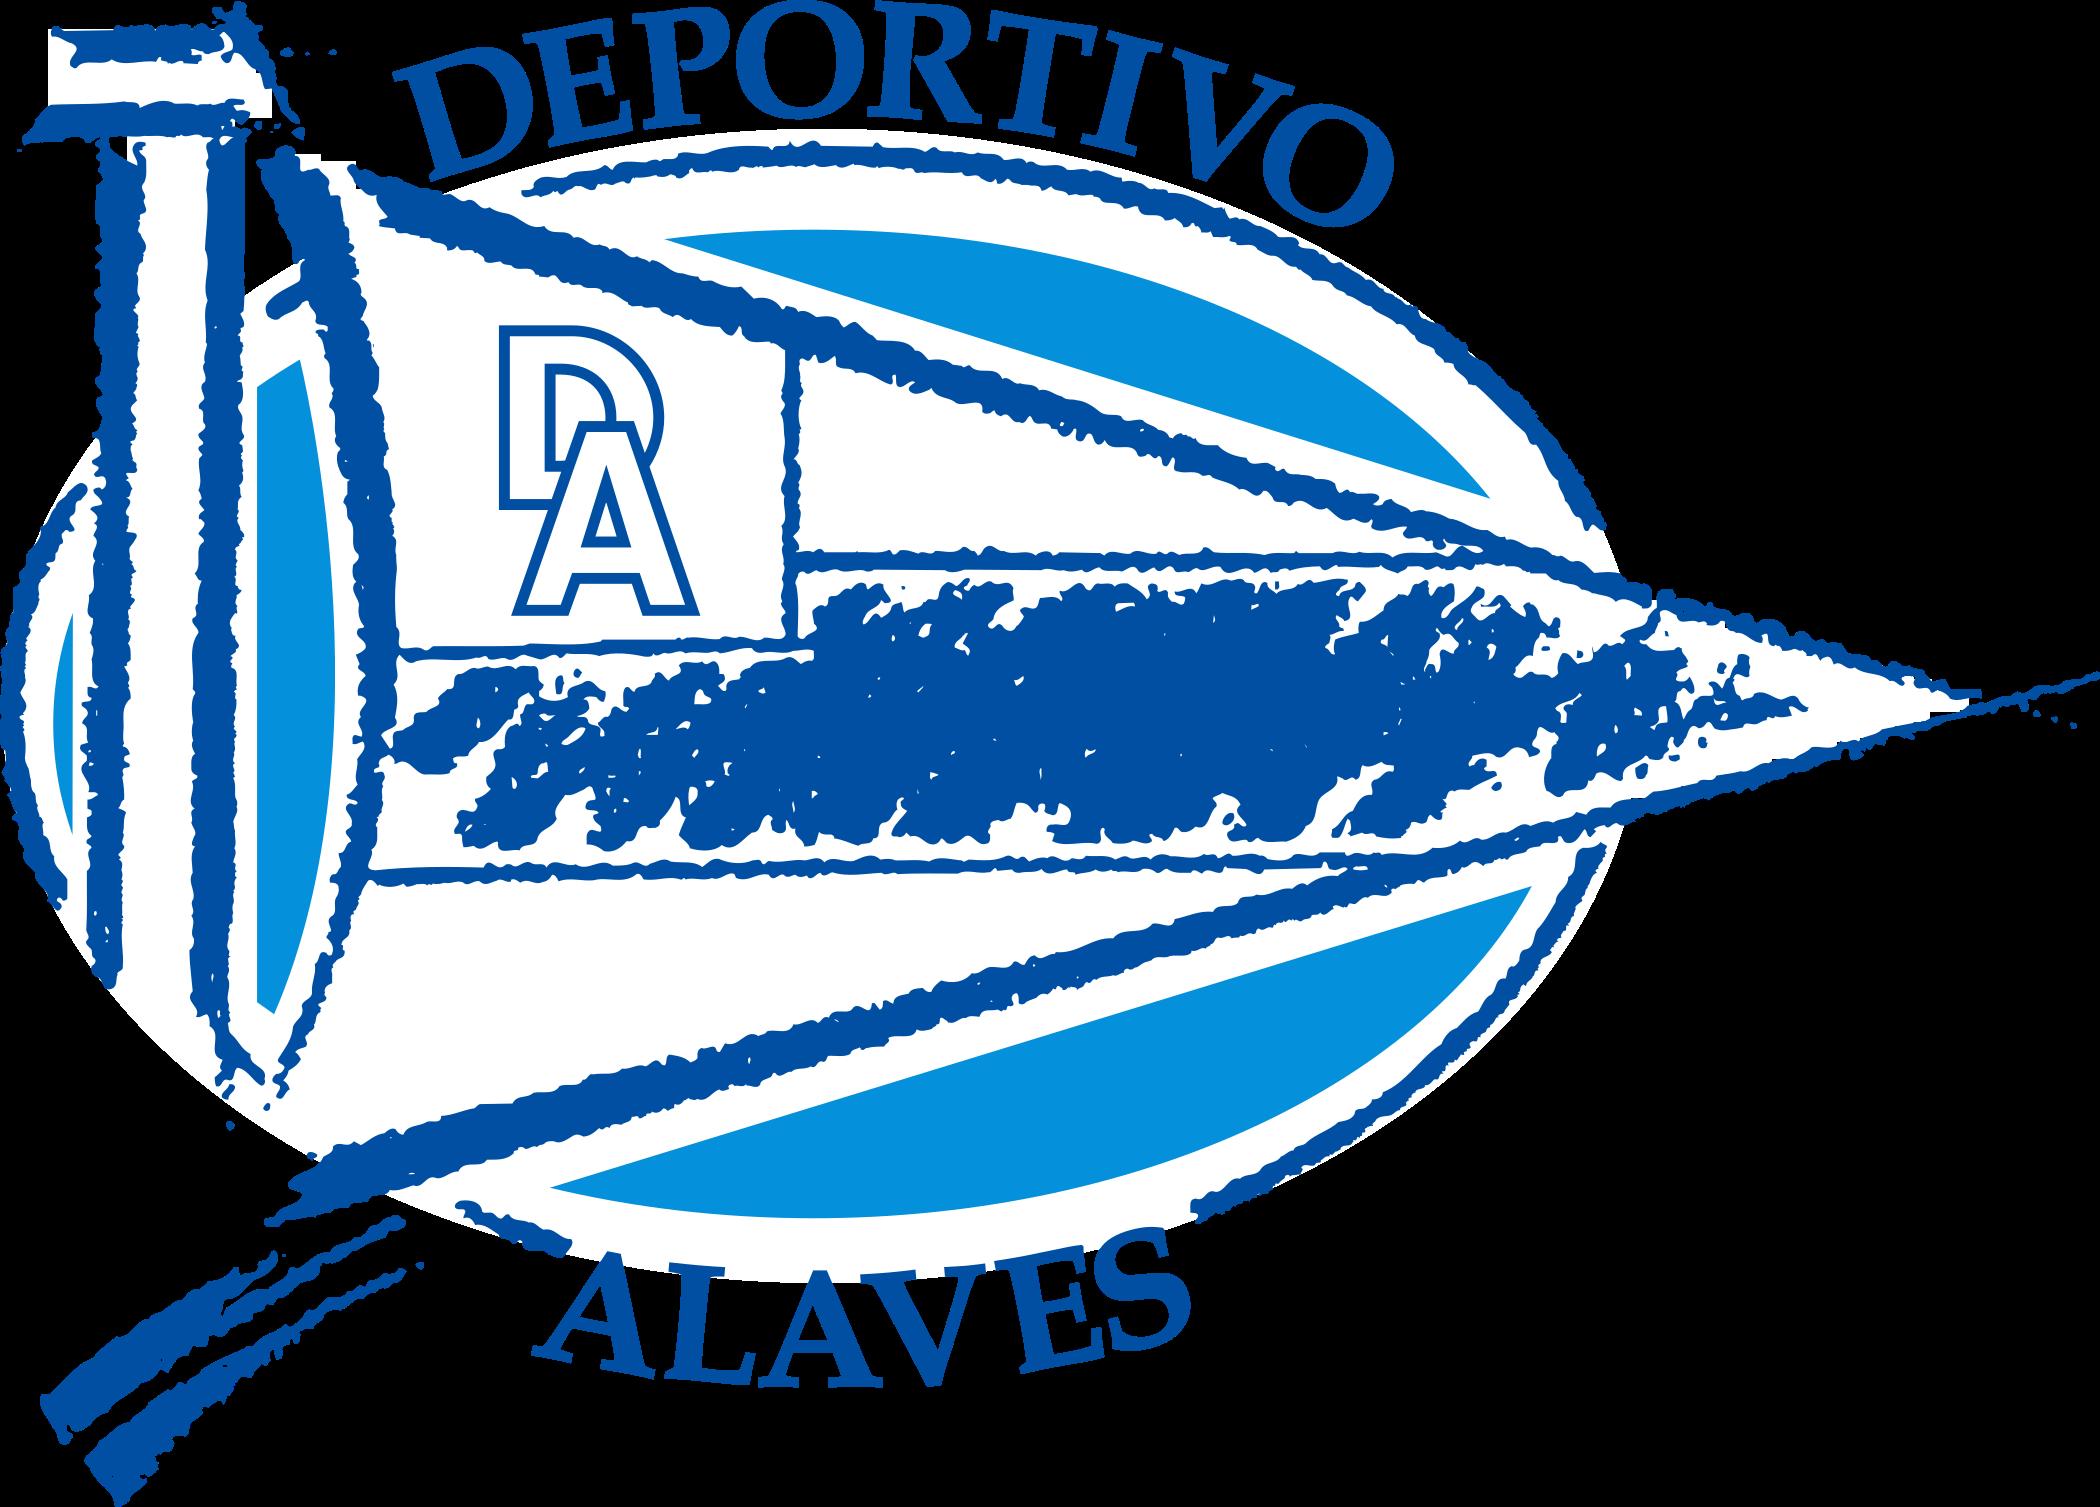 deportivo Alaves logo 1 - Deportivo Alavés Logo